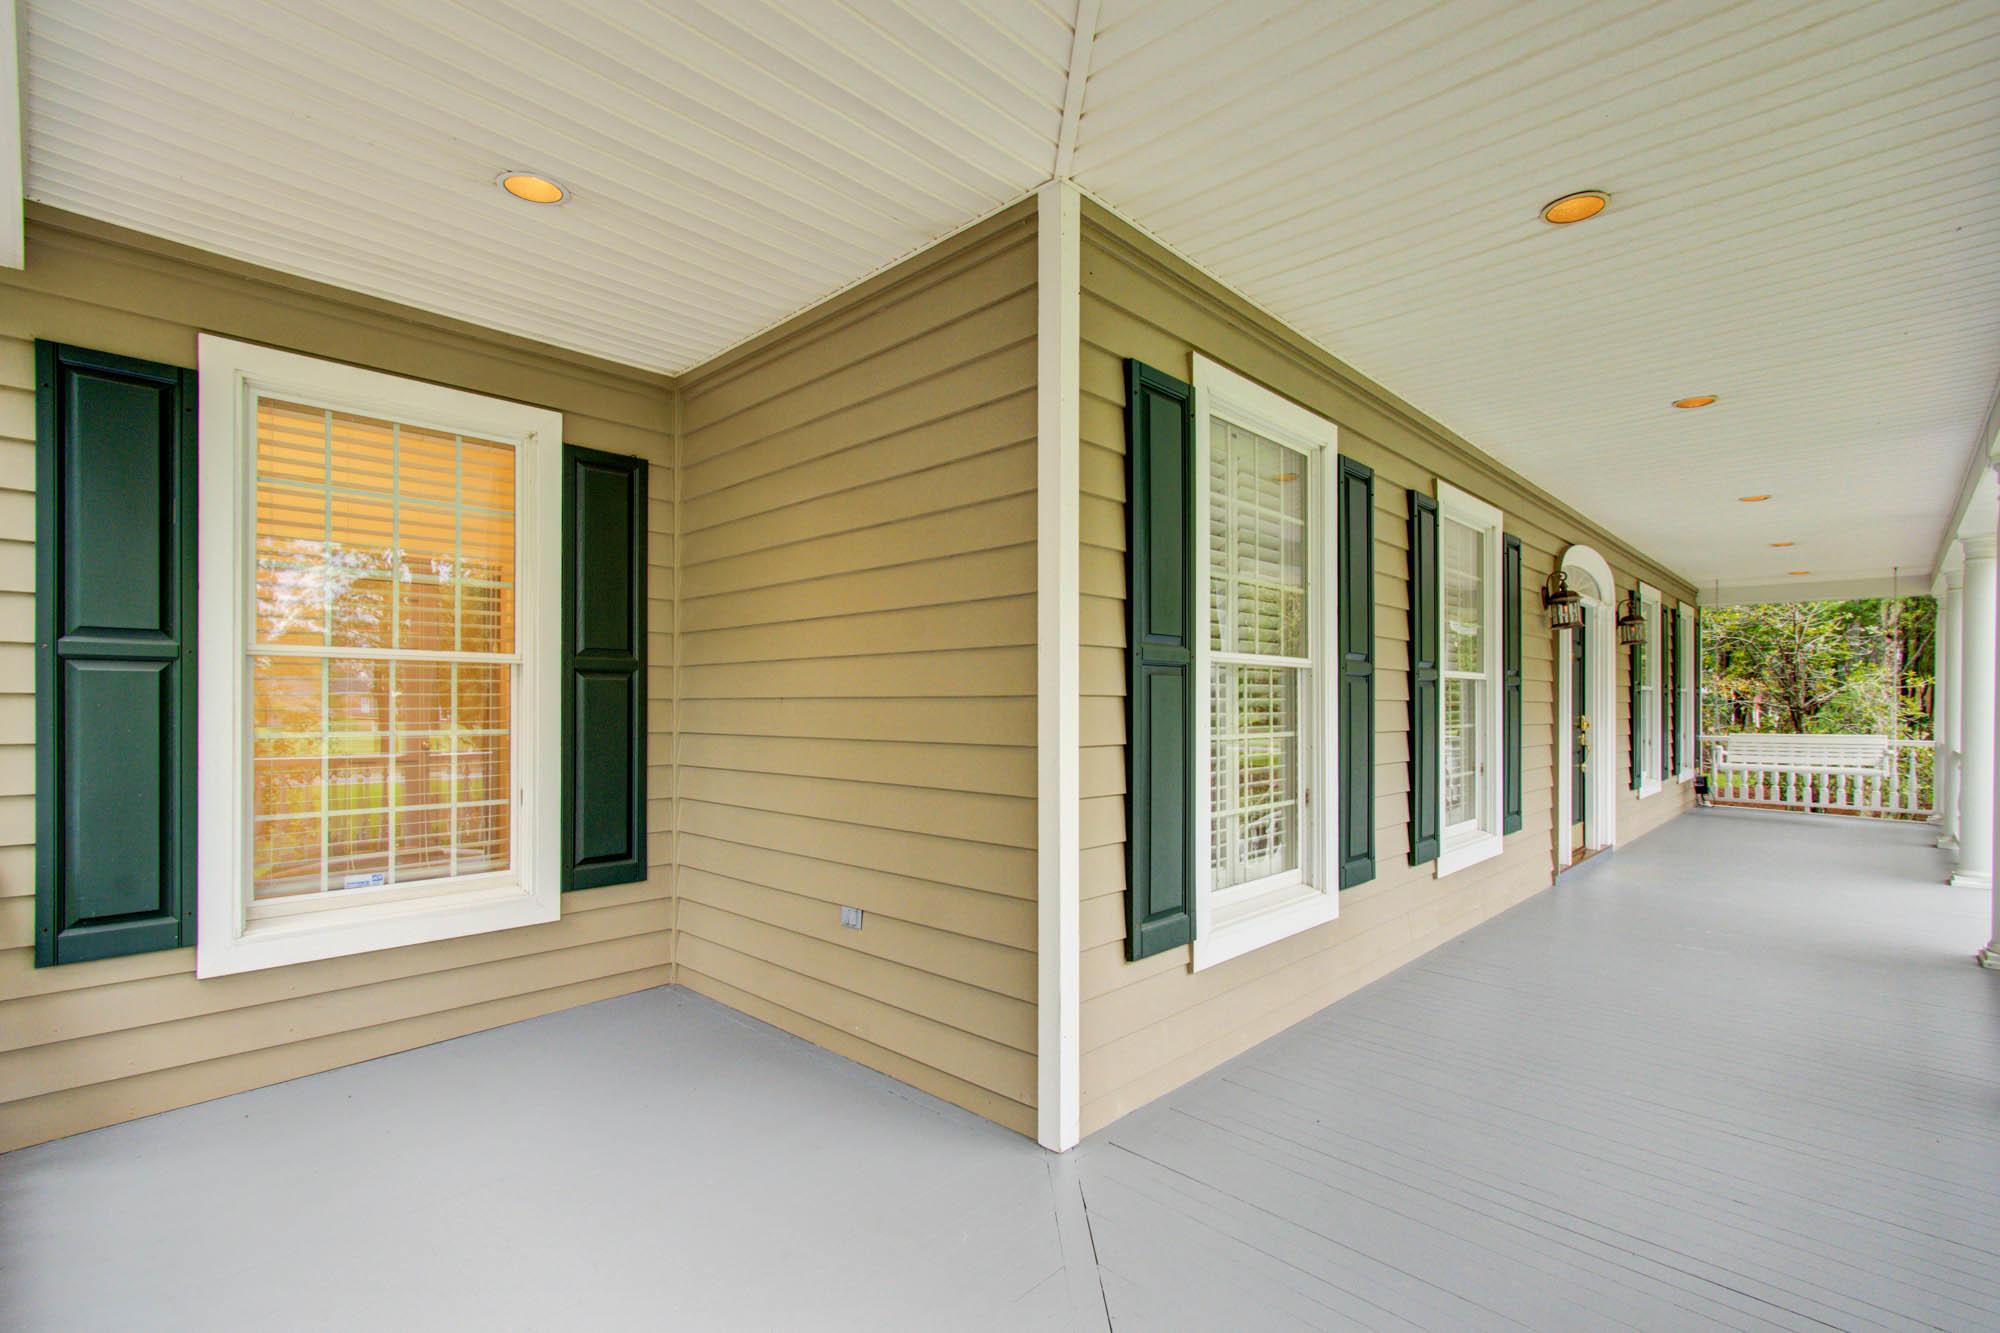 Dunes West Homes For Sale - 3515 Colonel Vanderhorst, Mount Pleasant, SC - 36